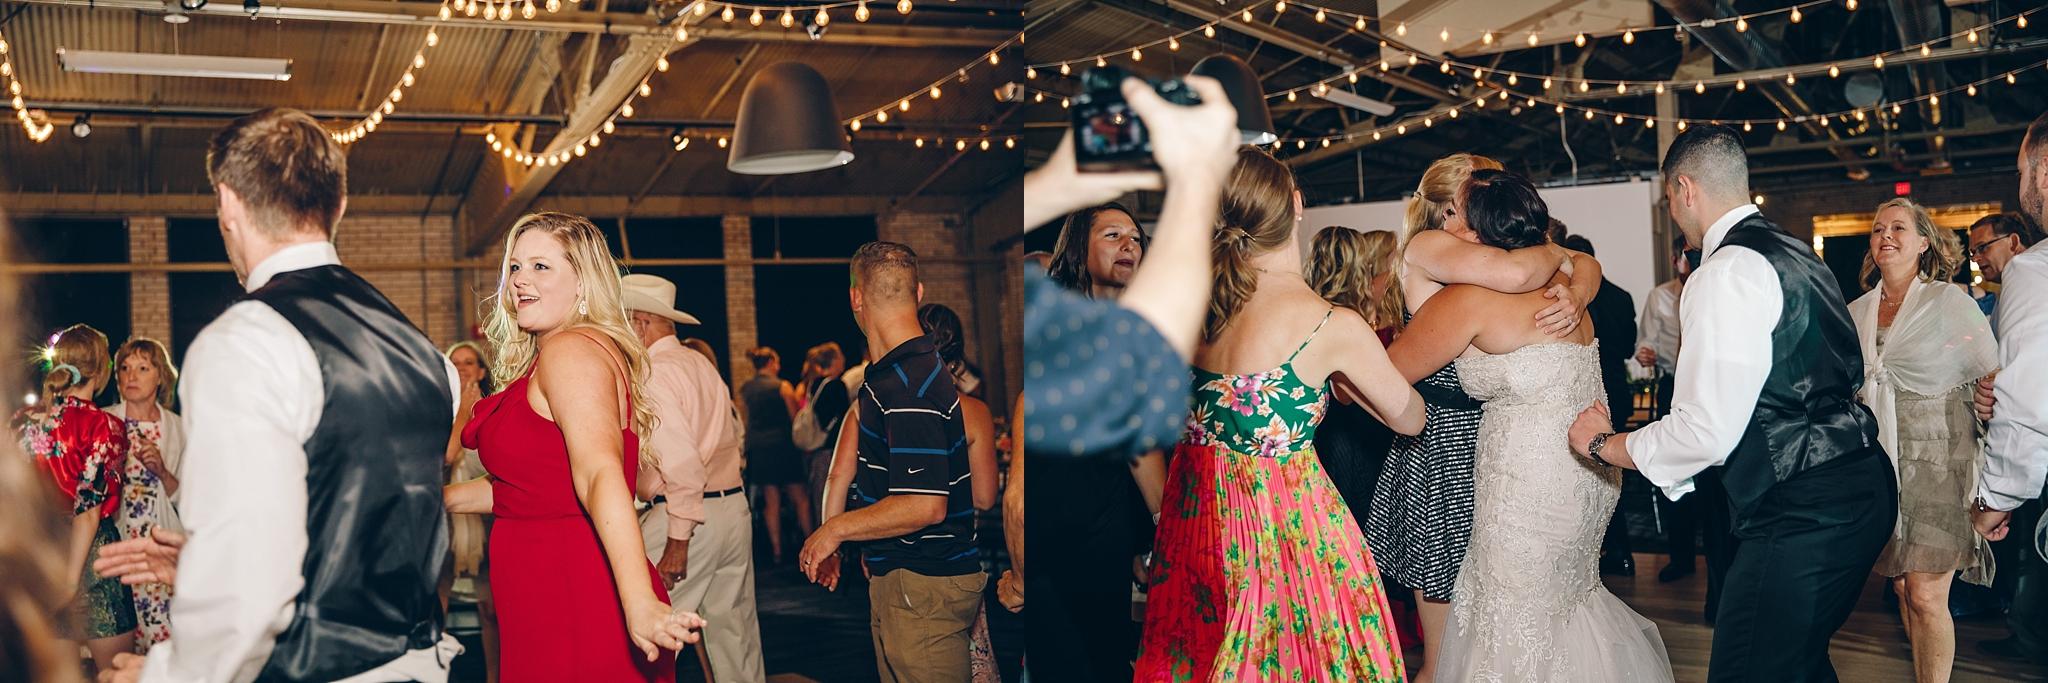 baker-lofts-holland-michigan-wedding-photographer_0405.jpg